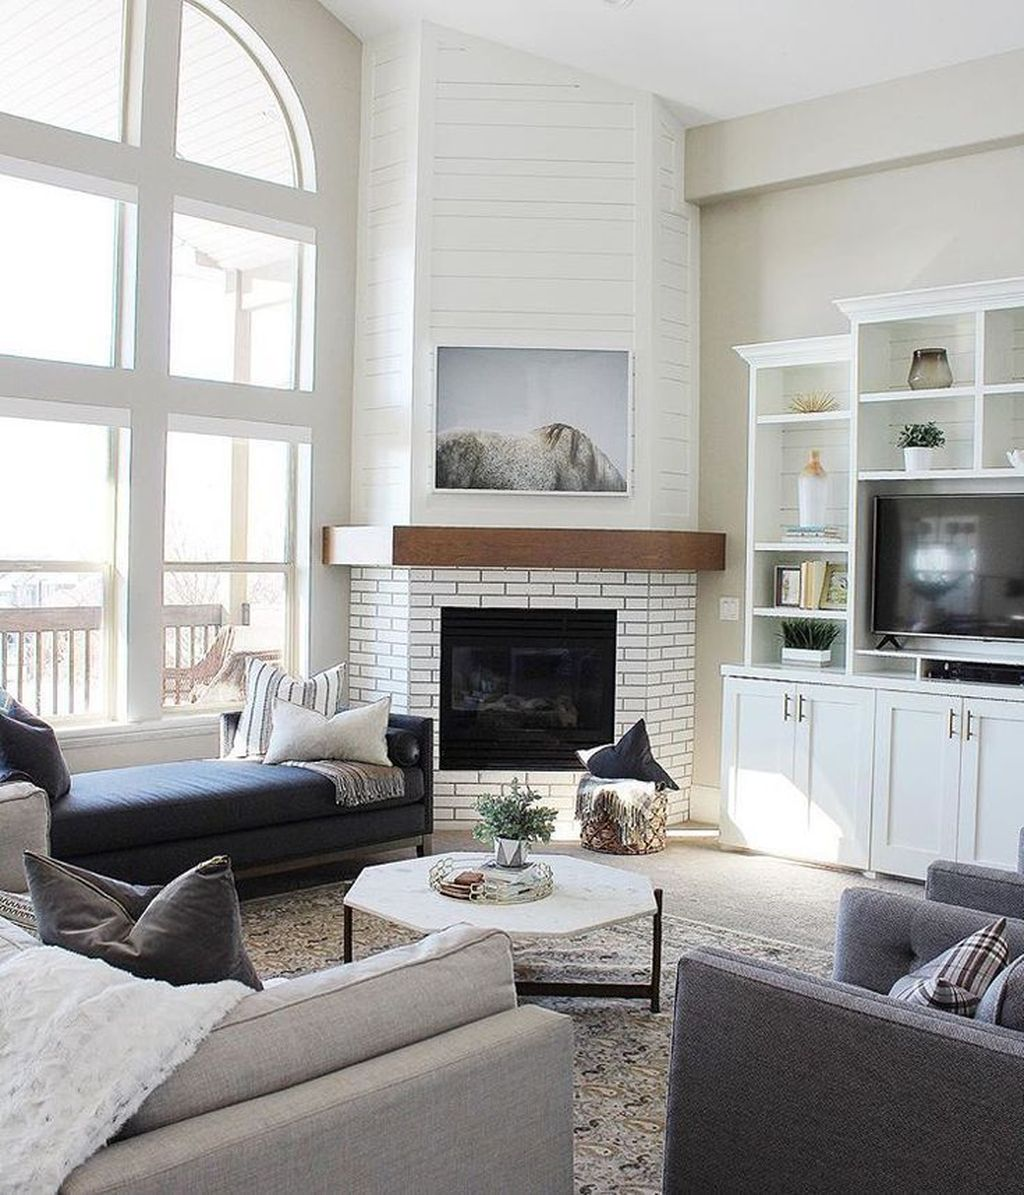 Stunning Corner Fireplace Design For Living Room 20